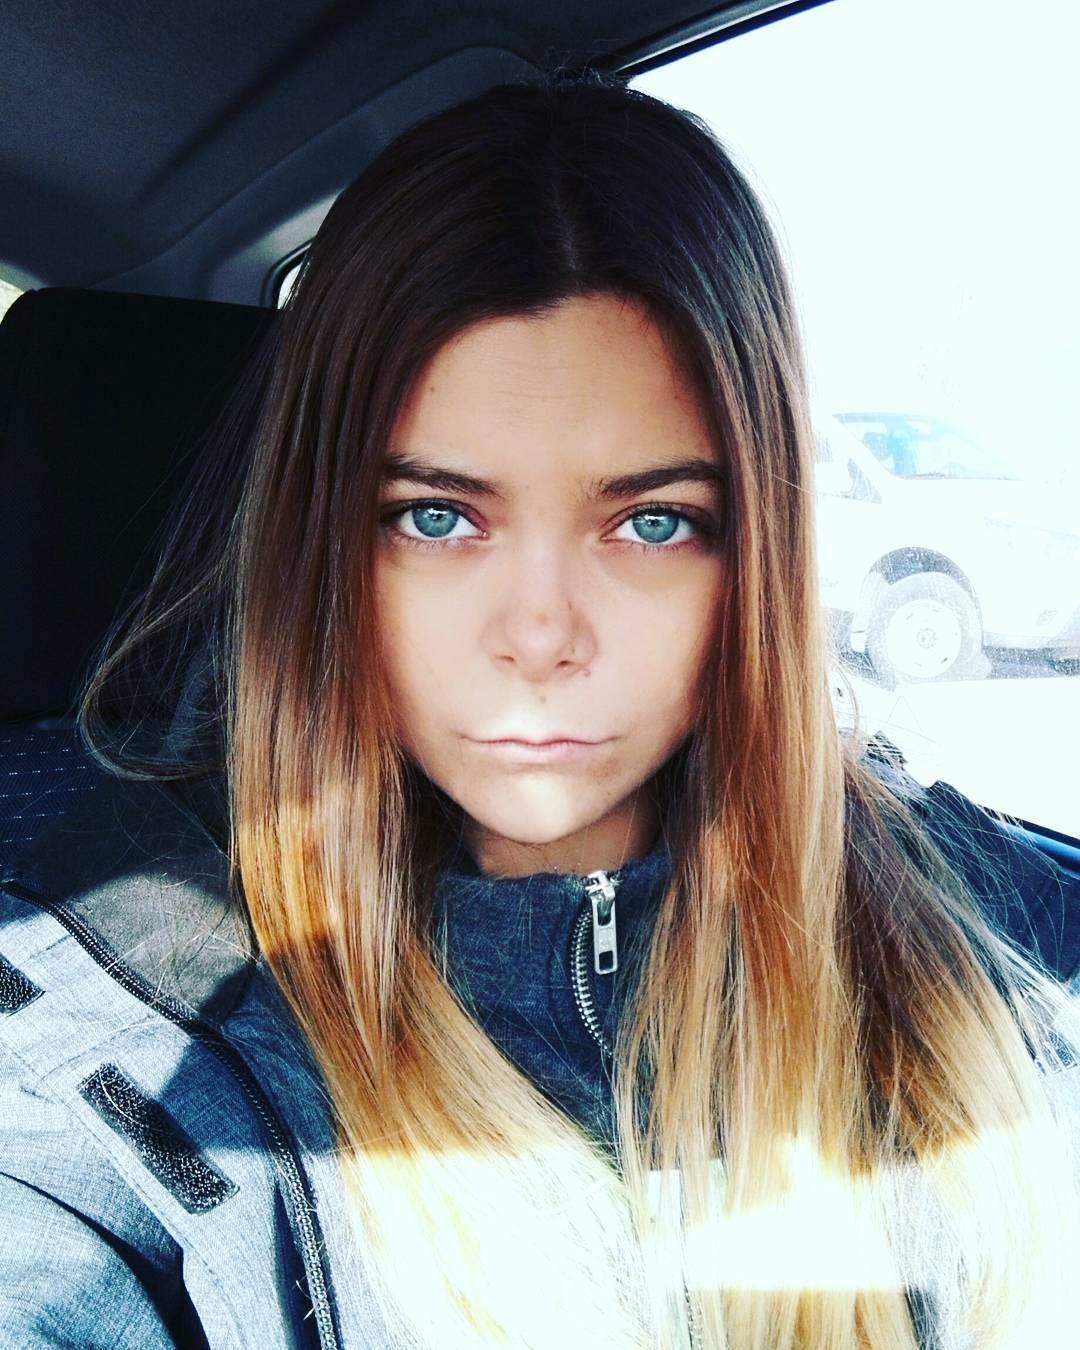 chilena videos de chicas escort